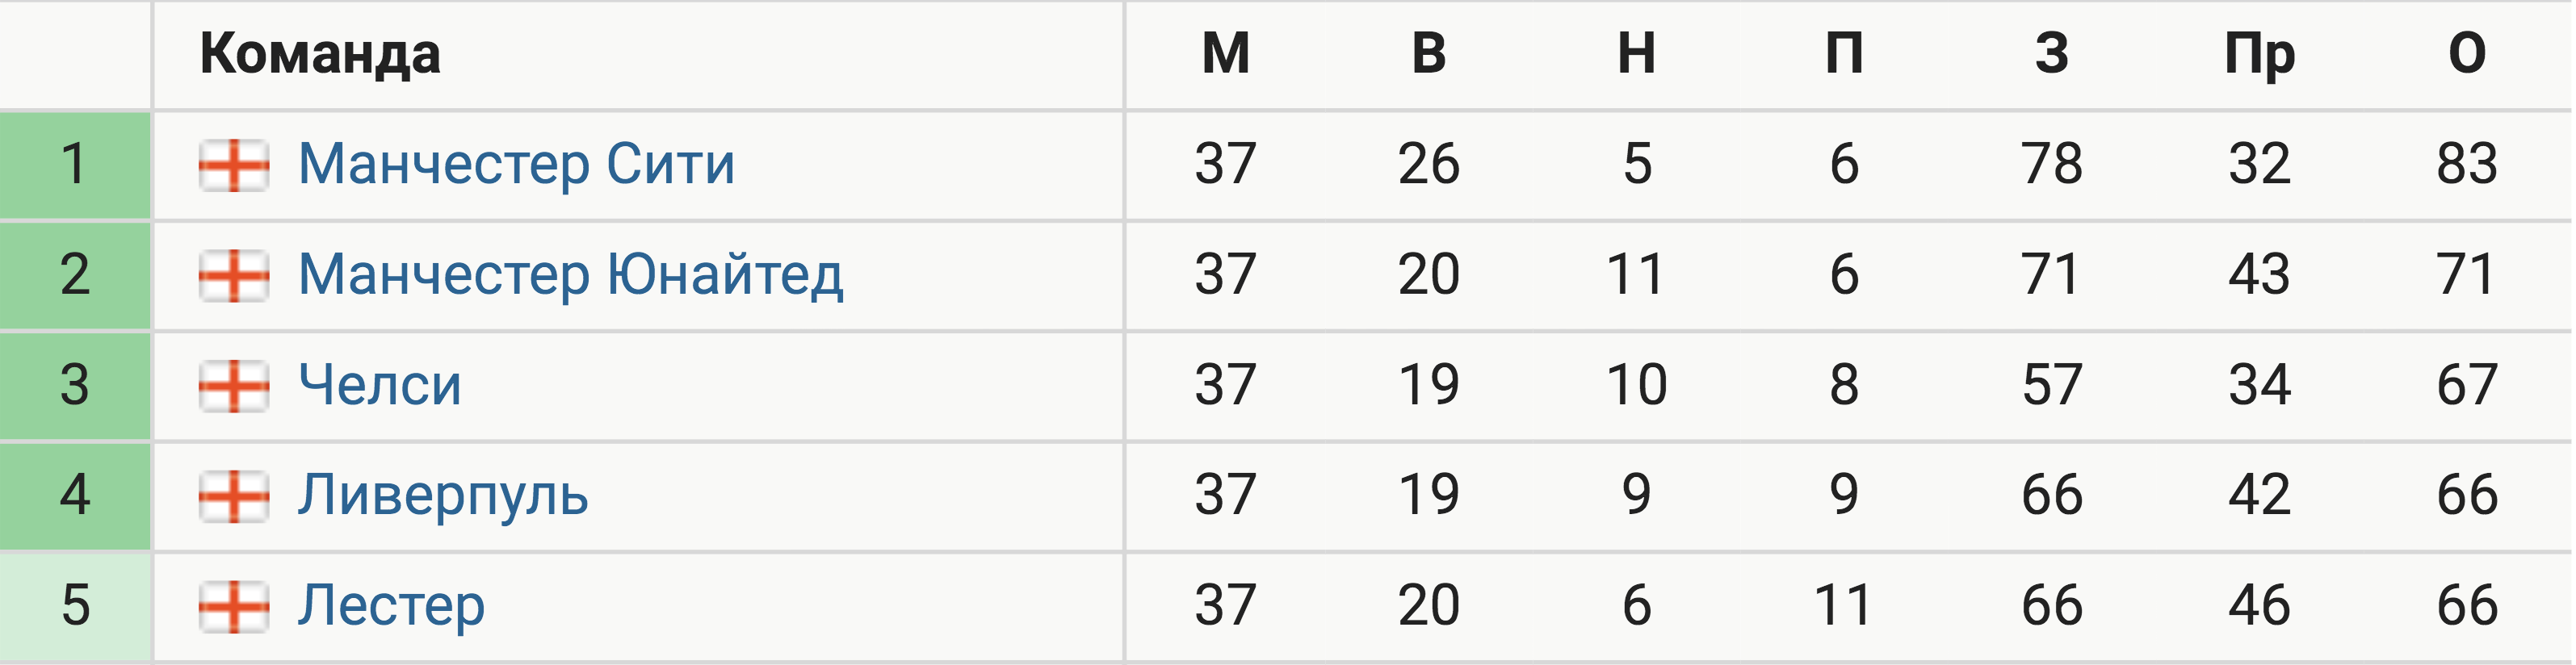 «Ливерпуль» поднялся в топ-4 за тур до конца, опередив «Лестер» по разнице голов